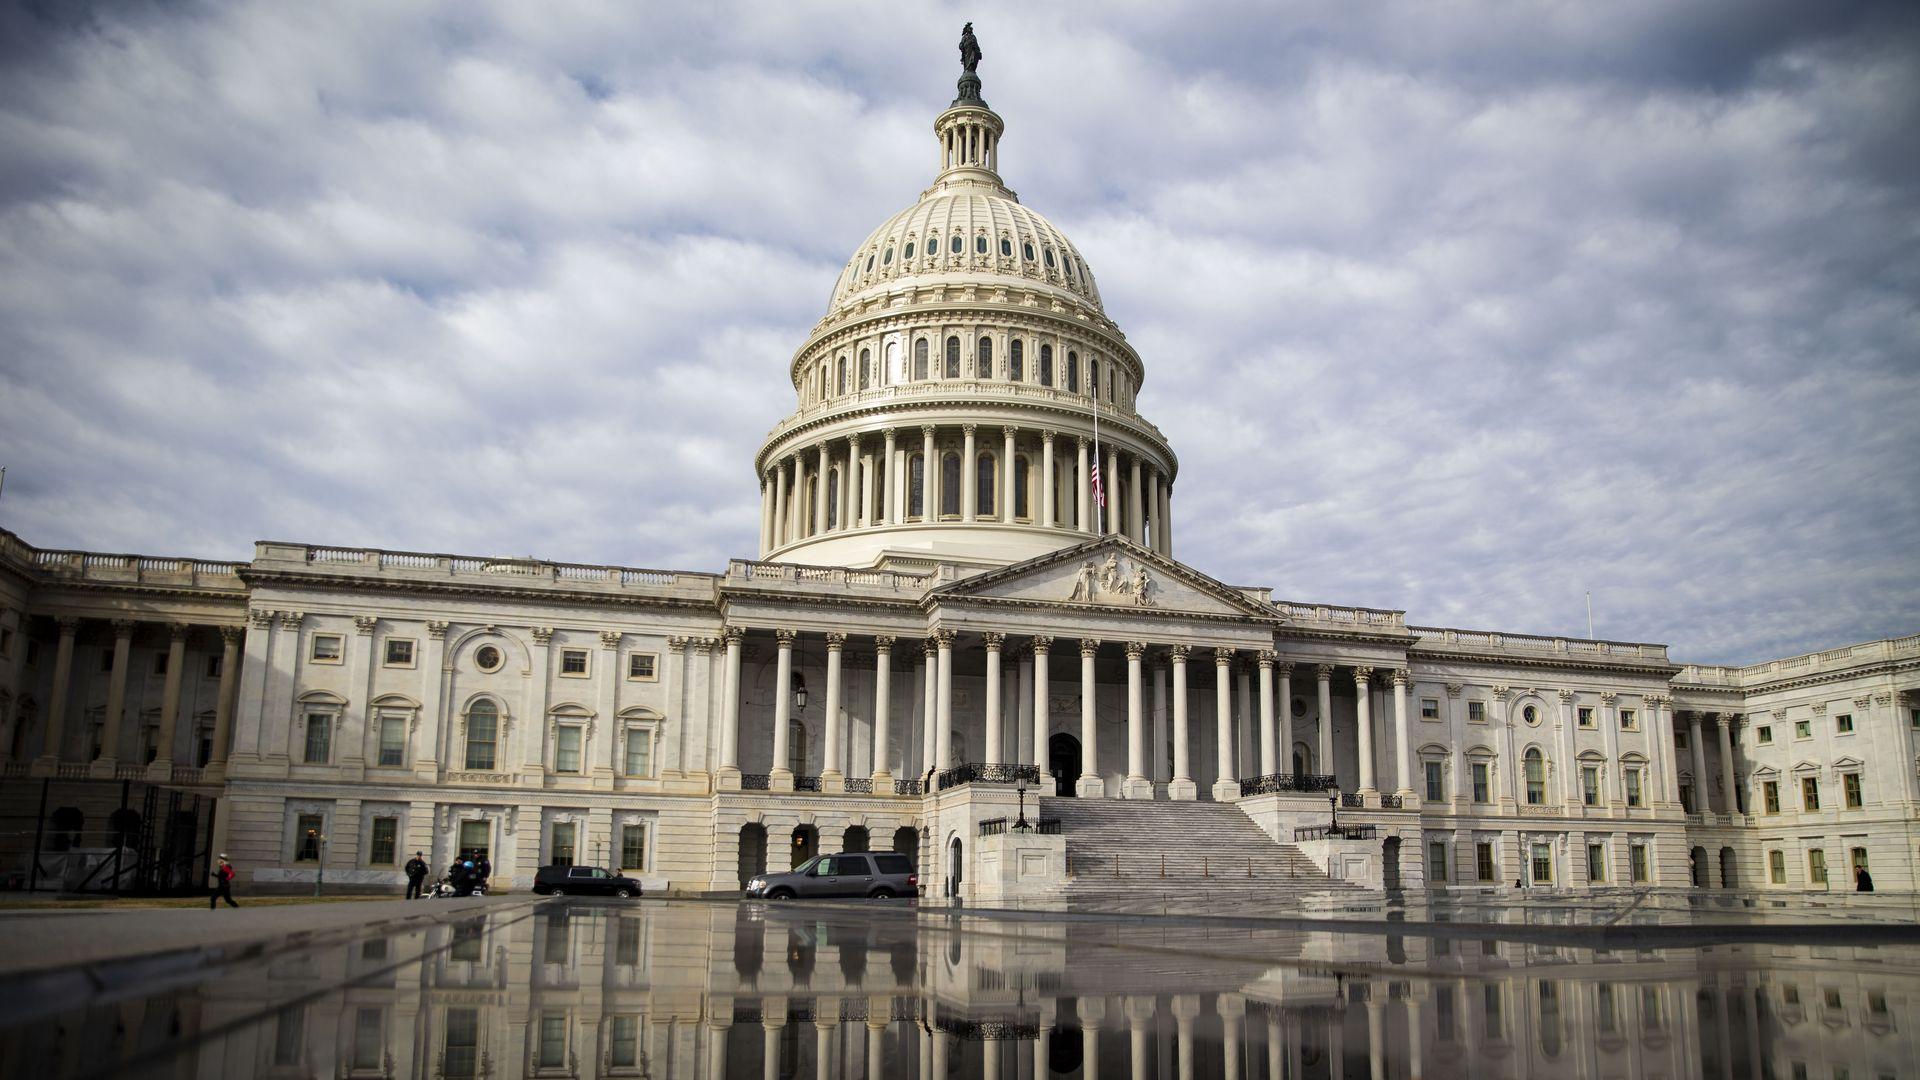 The U.S Capitol building.